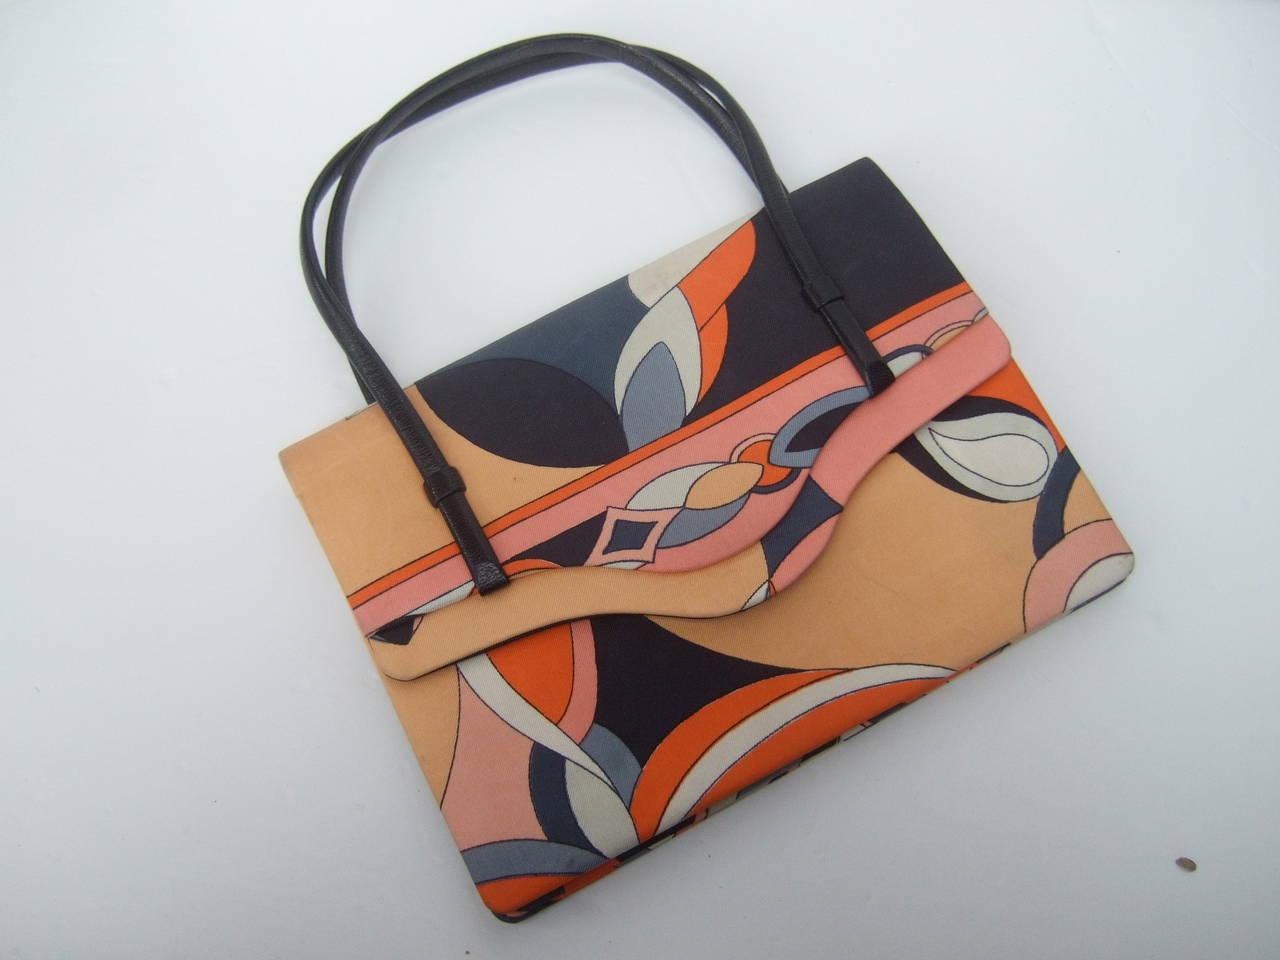 Emilio Pucci Italy Silk Diminutive Envelope Style Handbag c 1970 For Sale 1